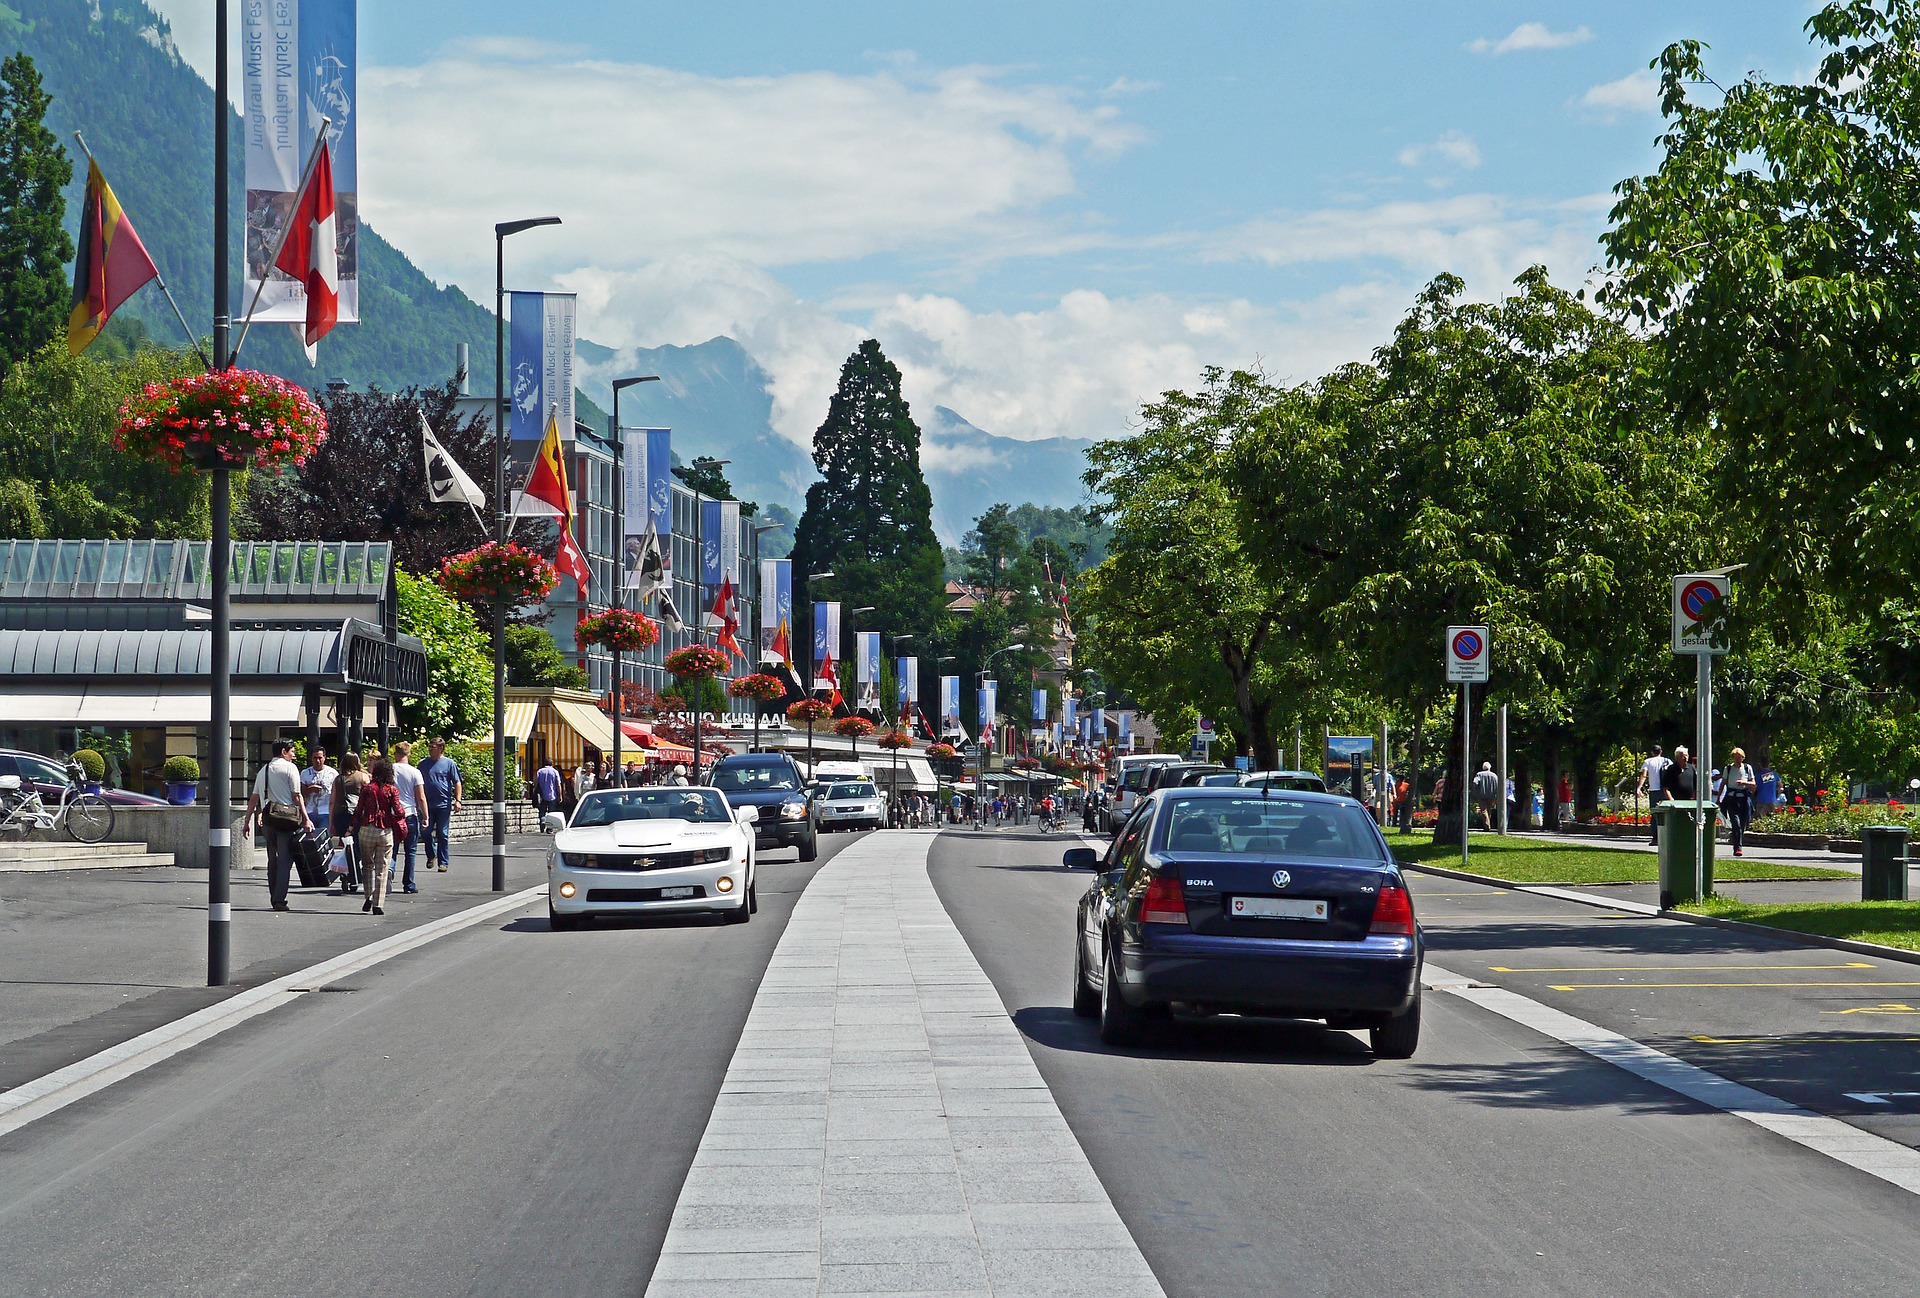 A main road in Switzerland